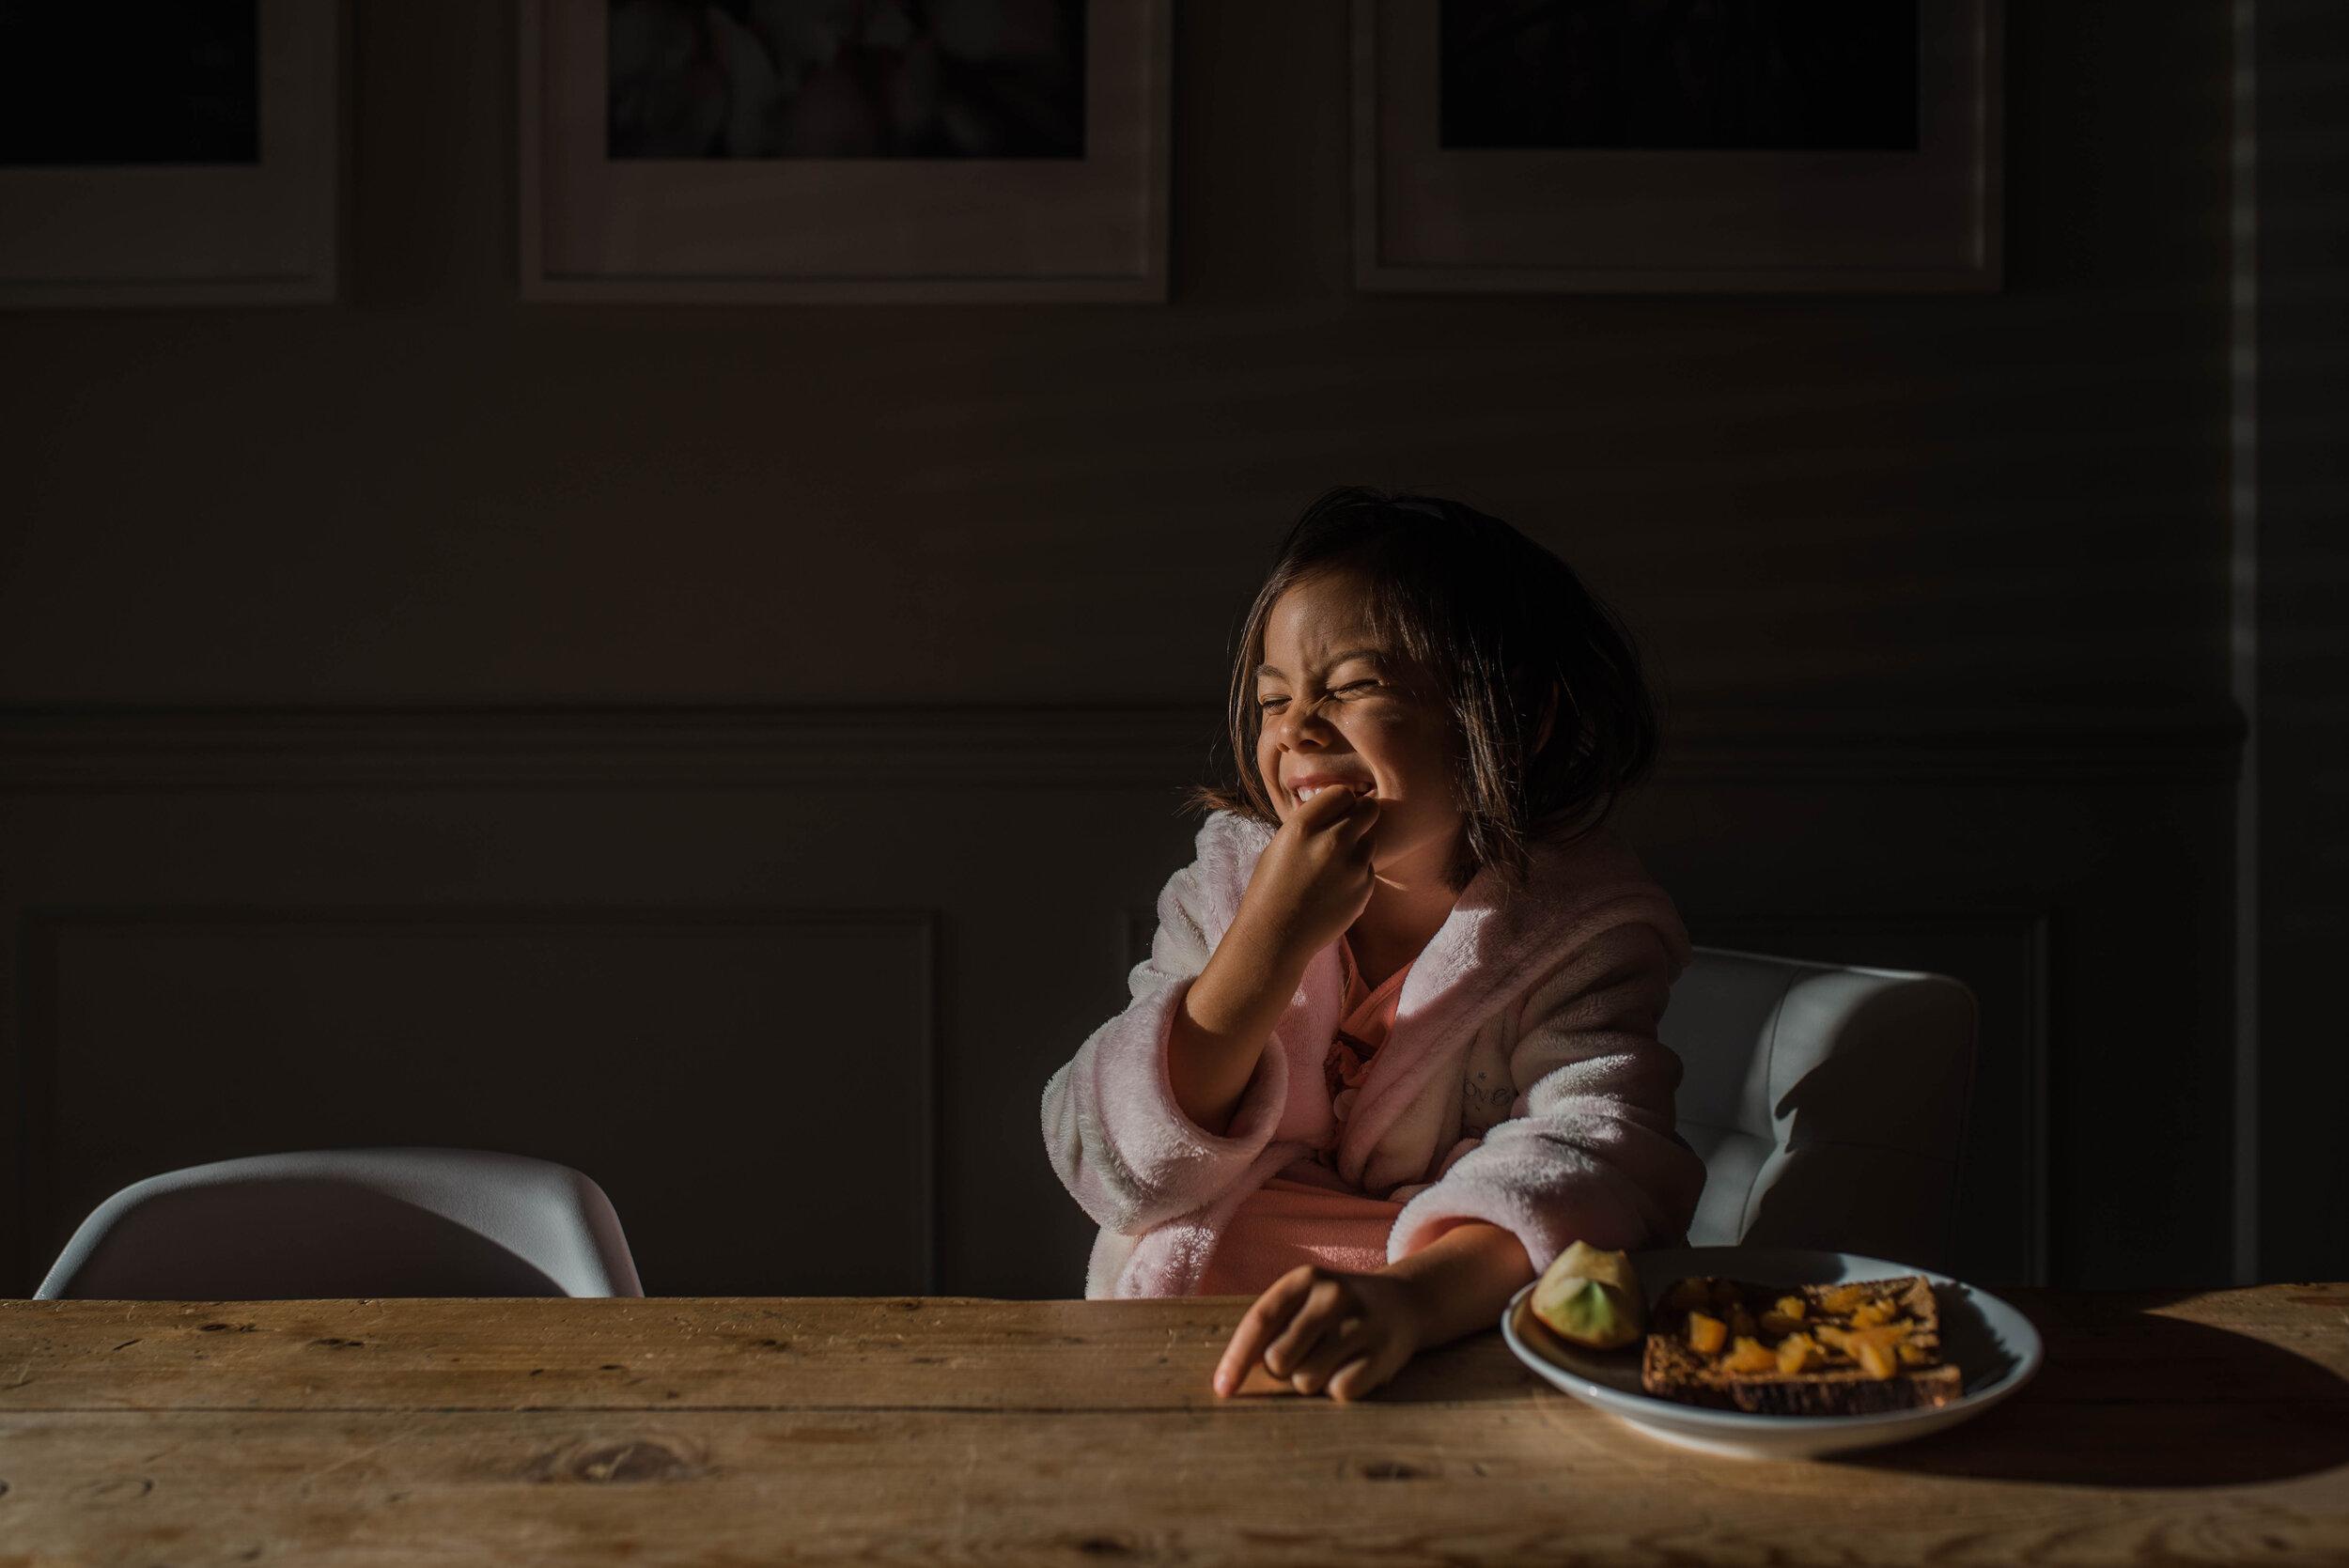 Breakfast-at-home-Chui-Photography-9727.jpg